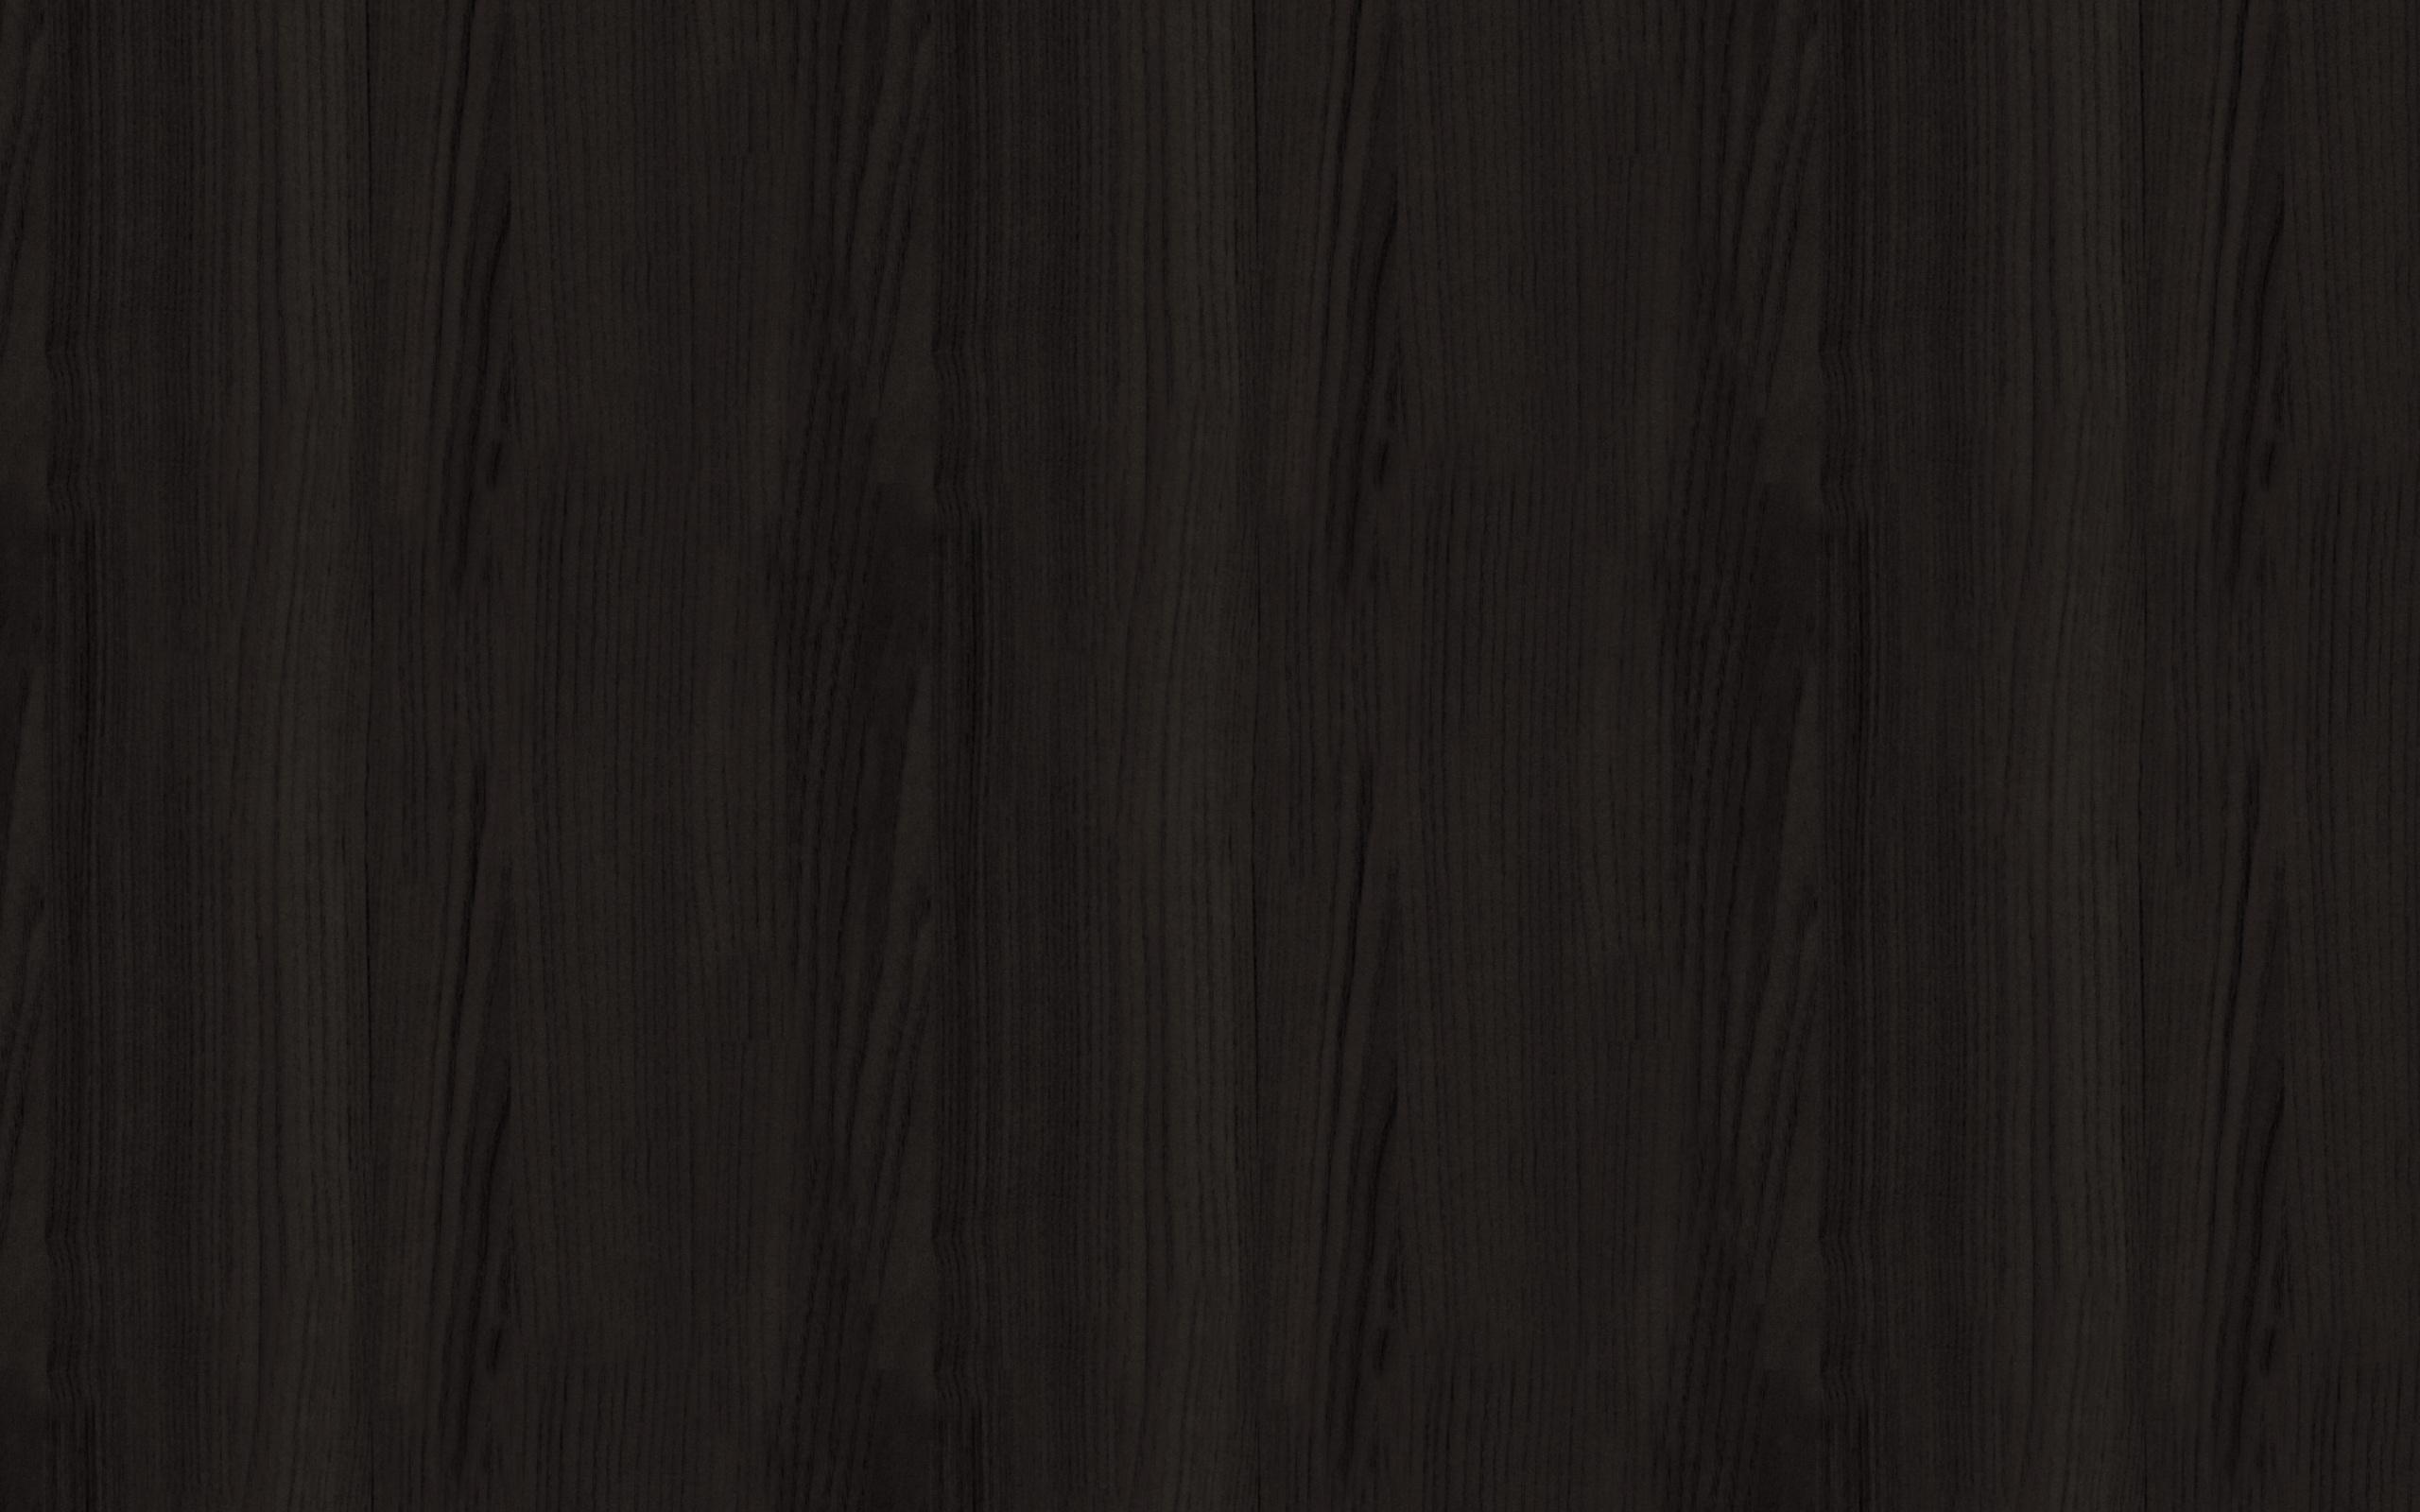 30 hardwood backgrounds wallpapers images pictures design trends - Dark wood wallpaper ...